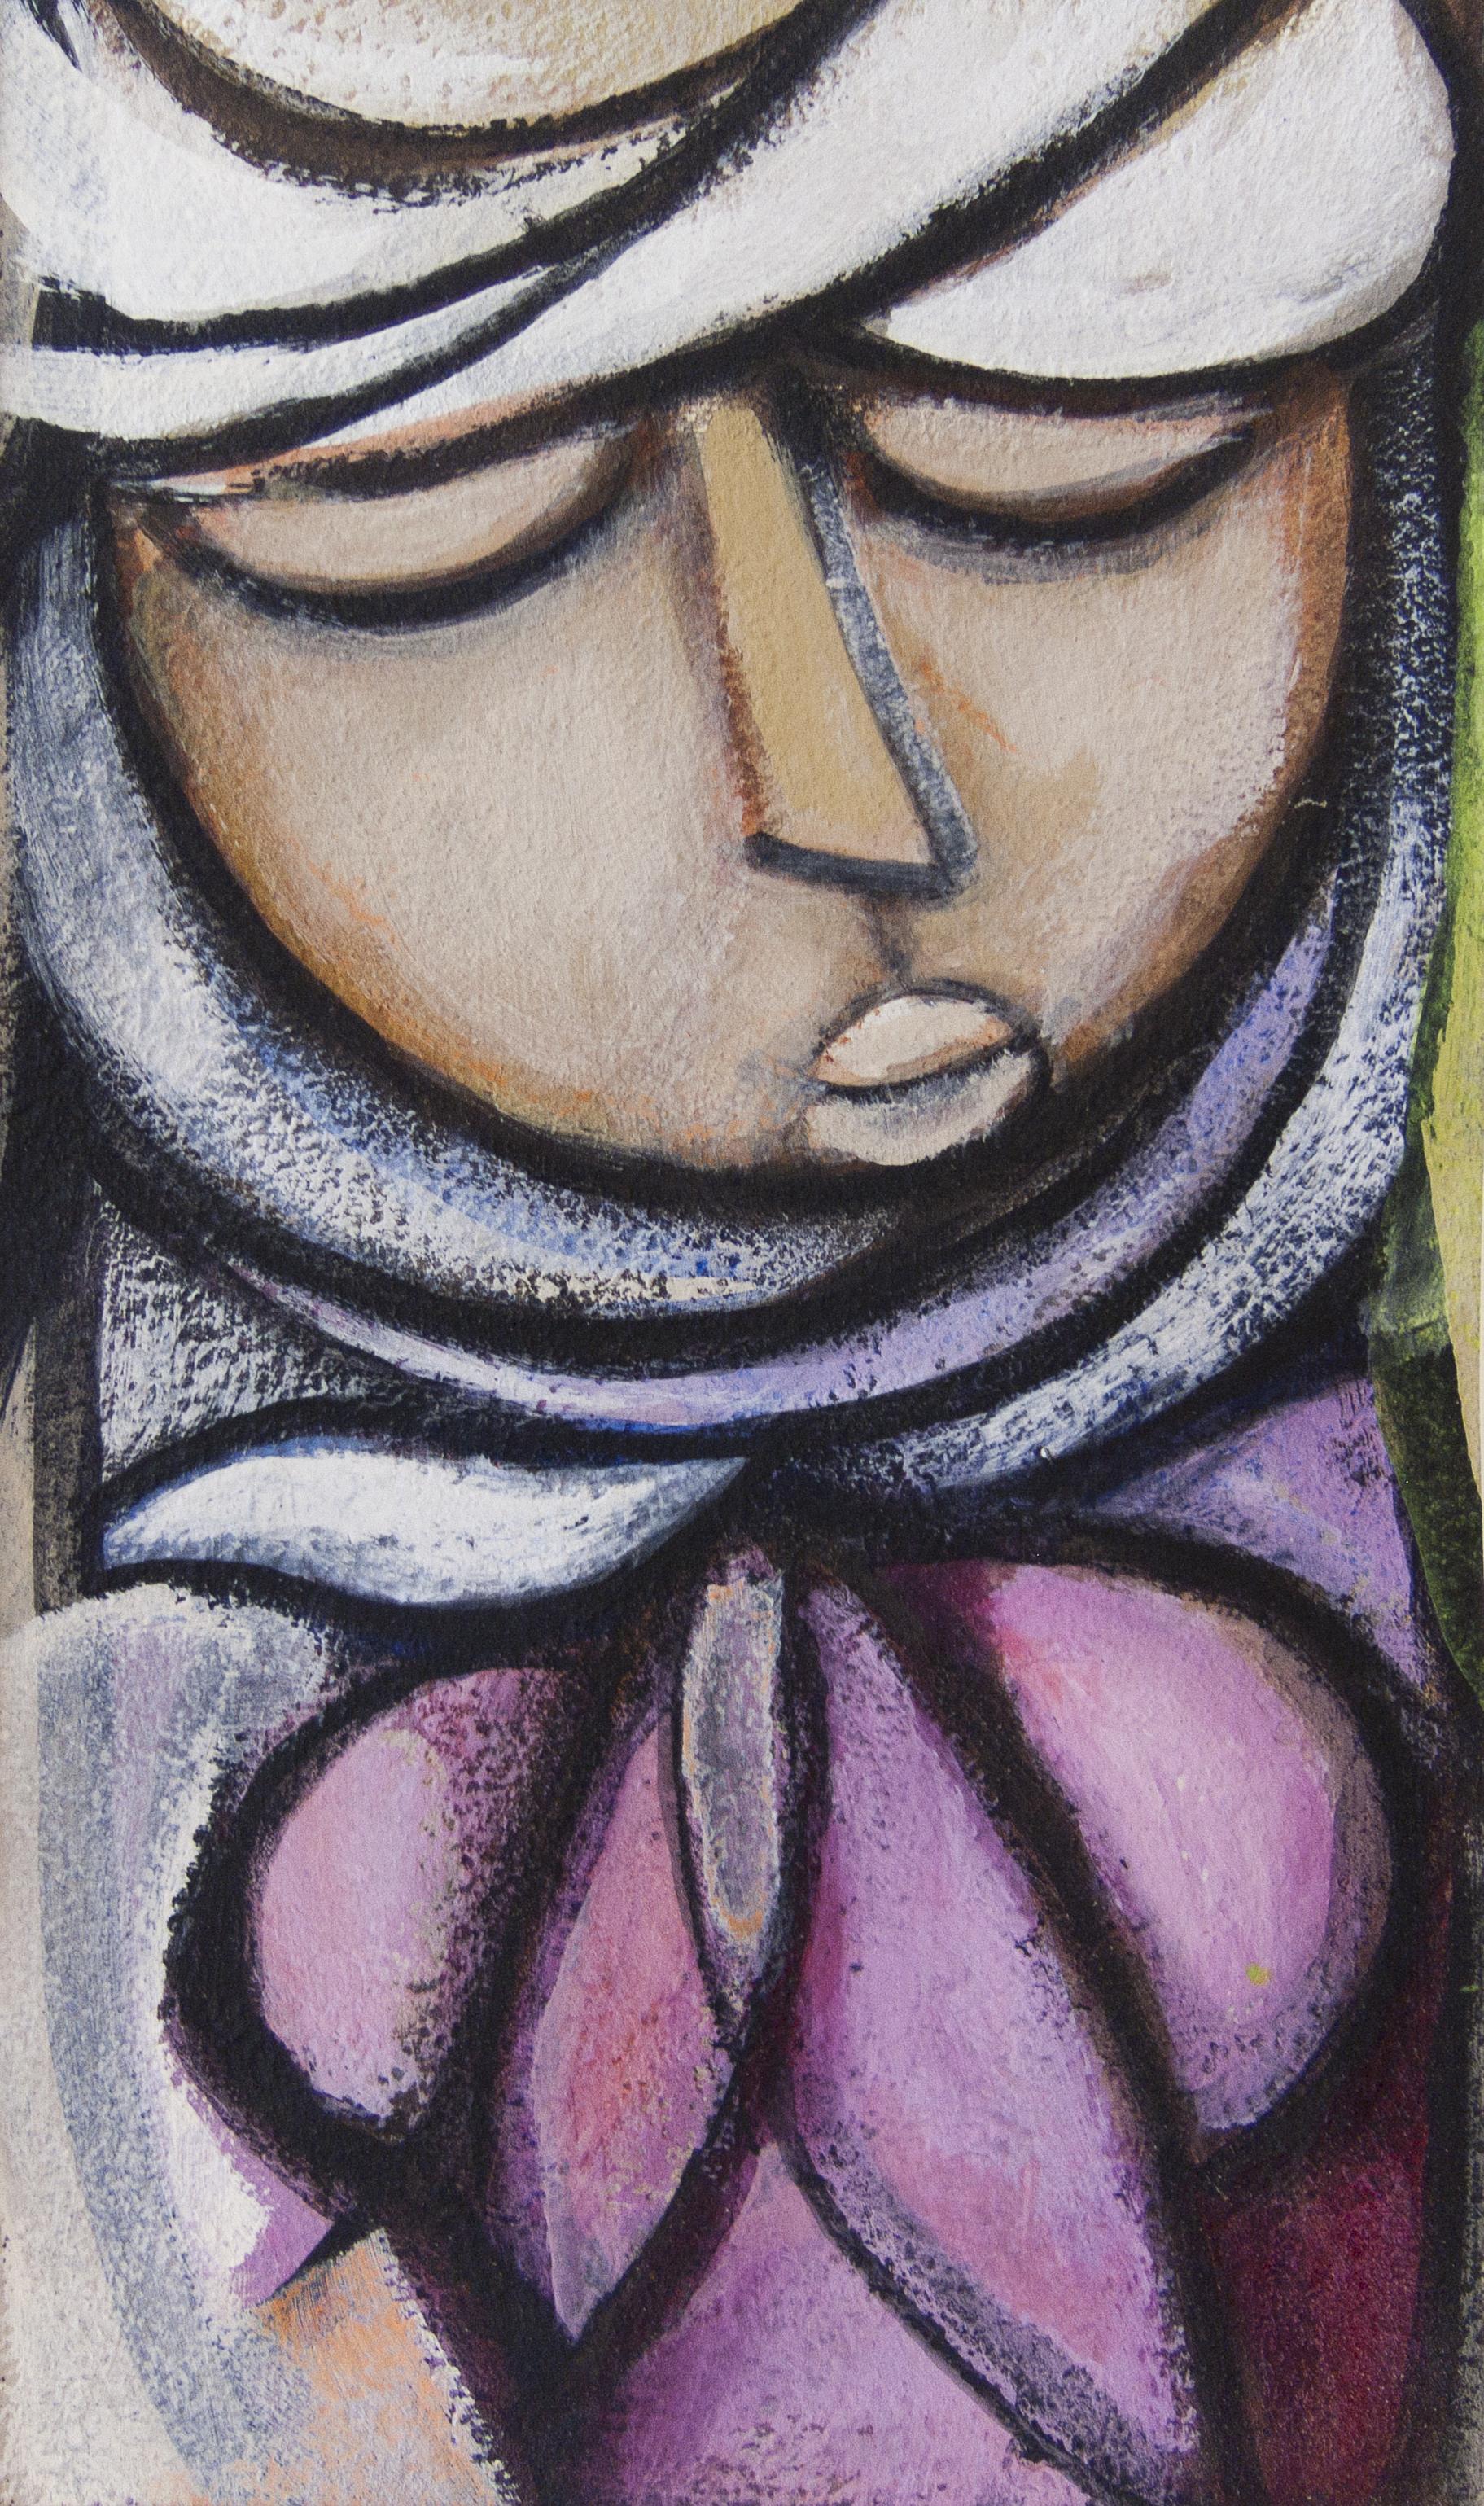 Untitled (Woman in White Headdress)